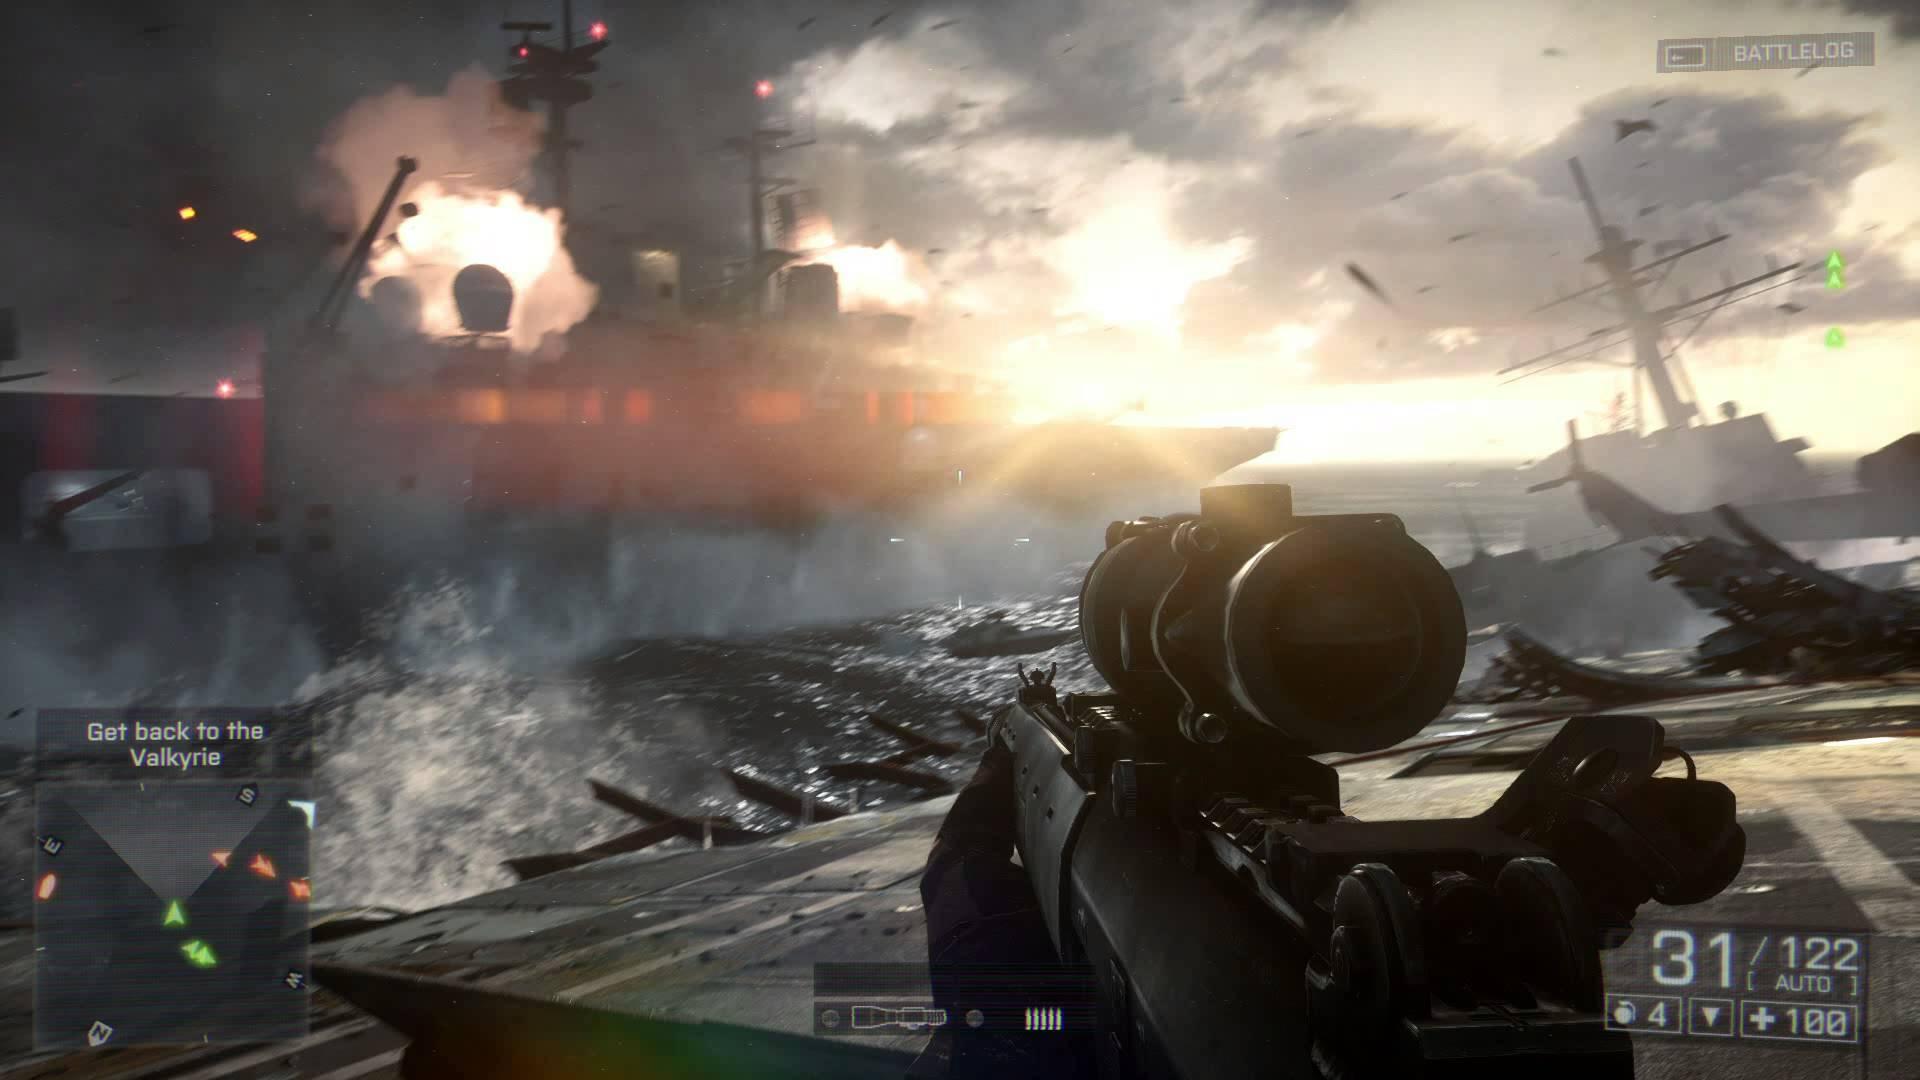 battlefield-4-angry-sea